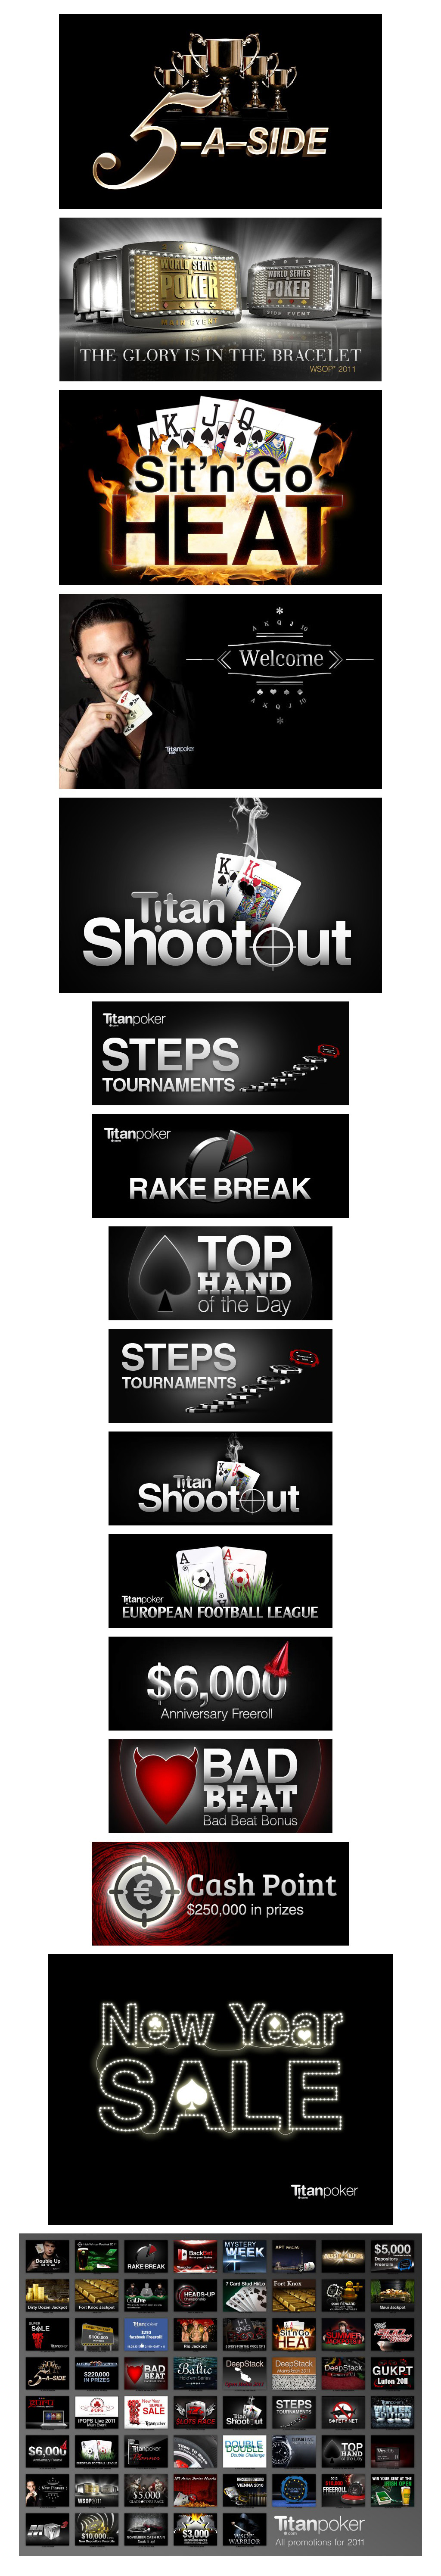 Titan Ad campaigns Advertisement capmpaign graphics for Titan Poker and Titan Bet